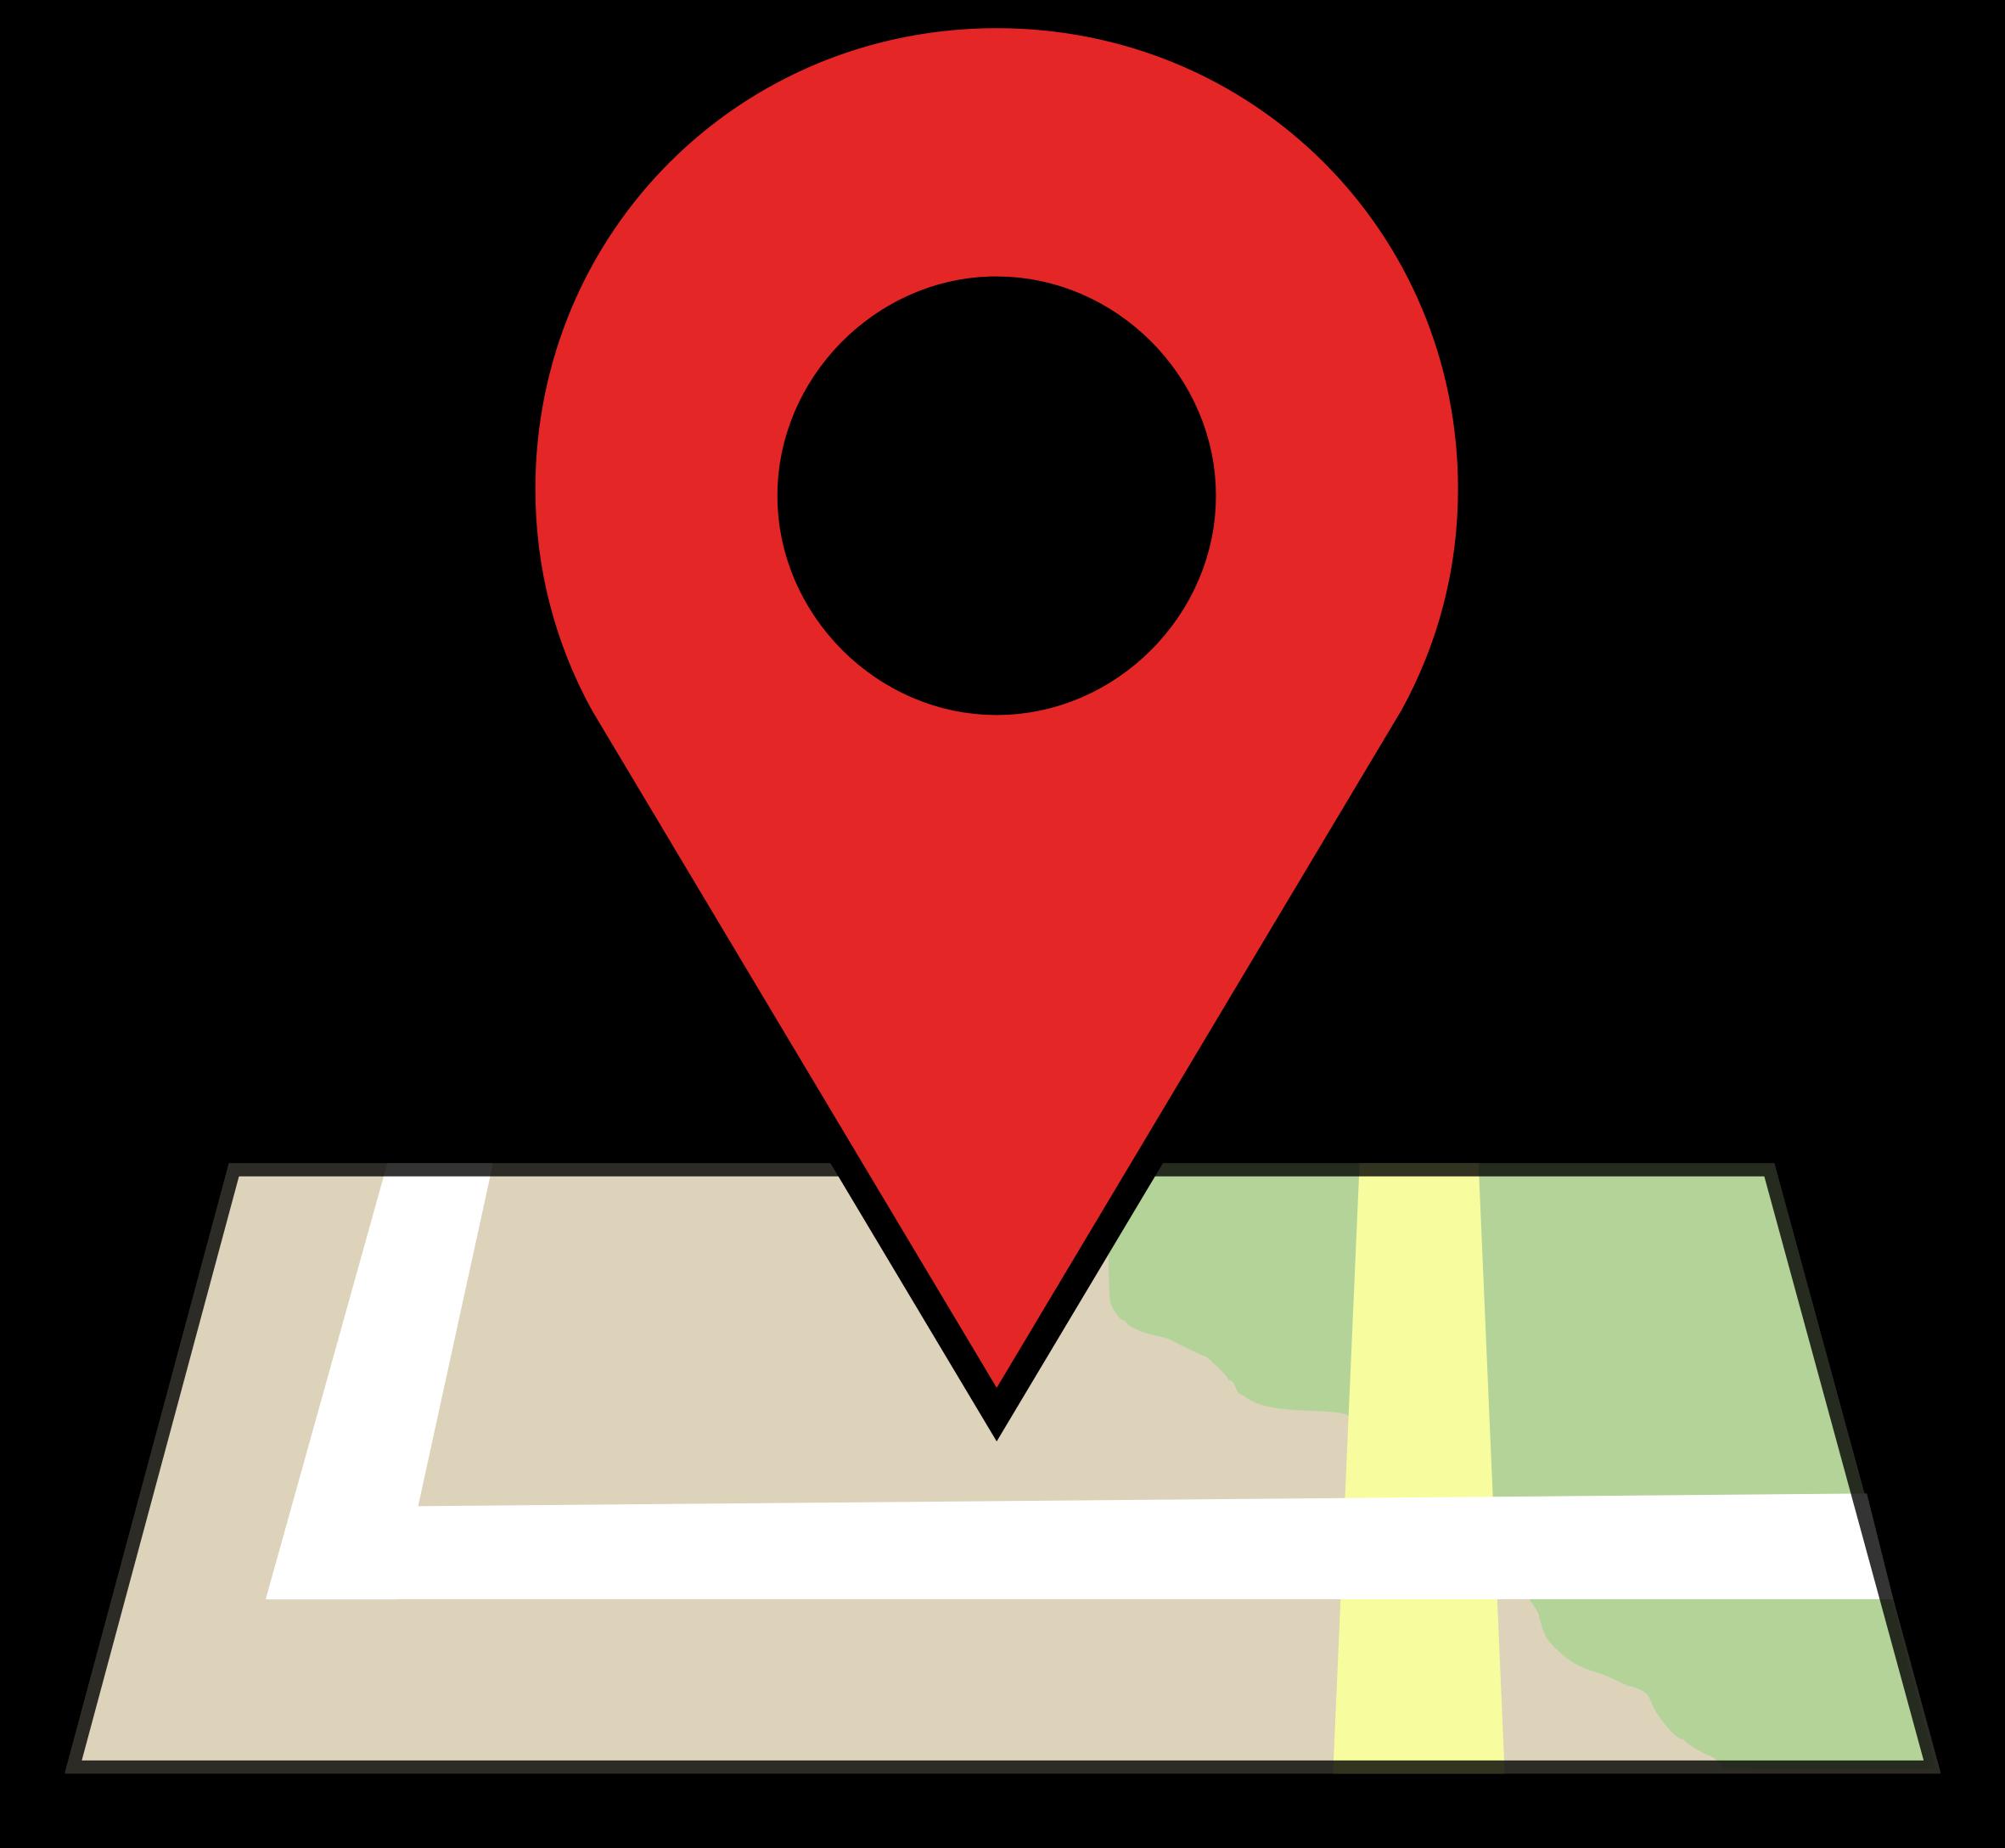 Clipart map nearby. Location clip art panda